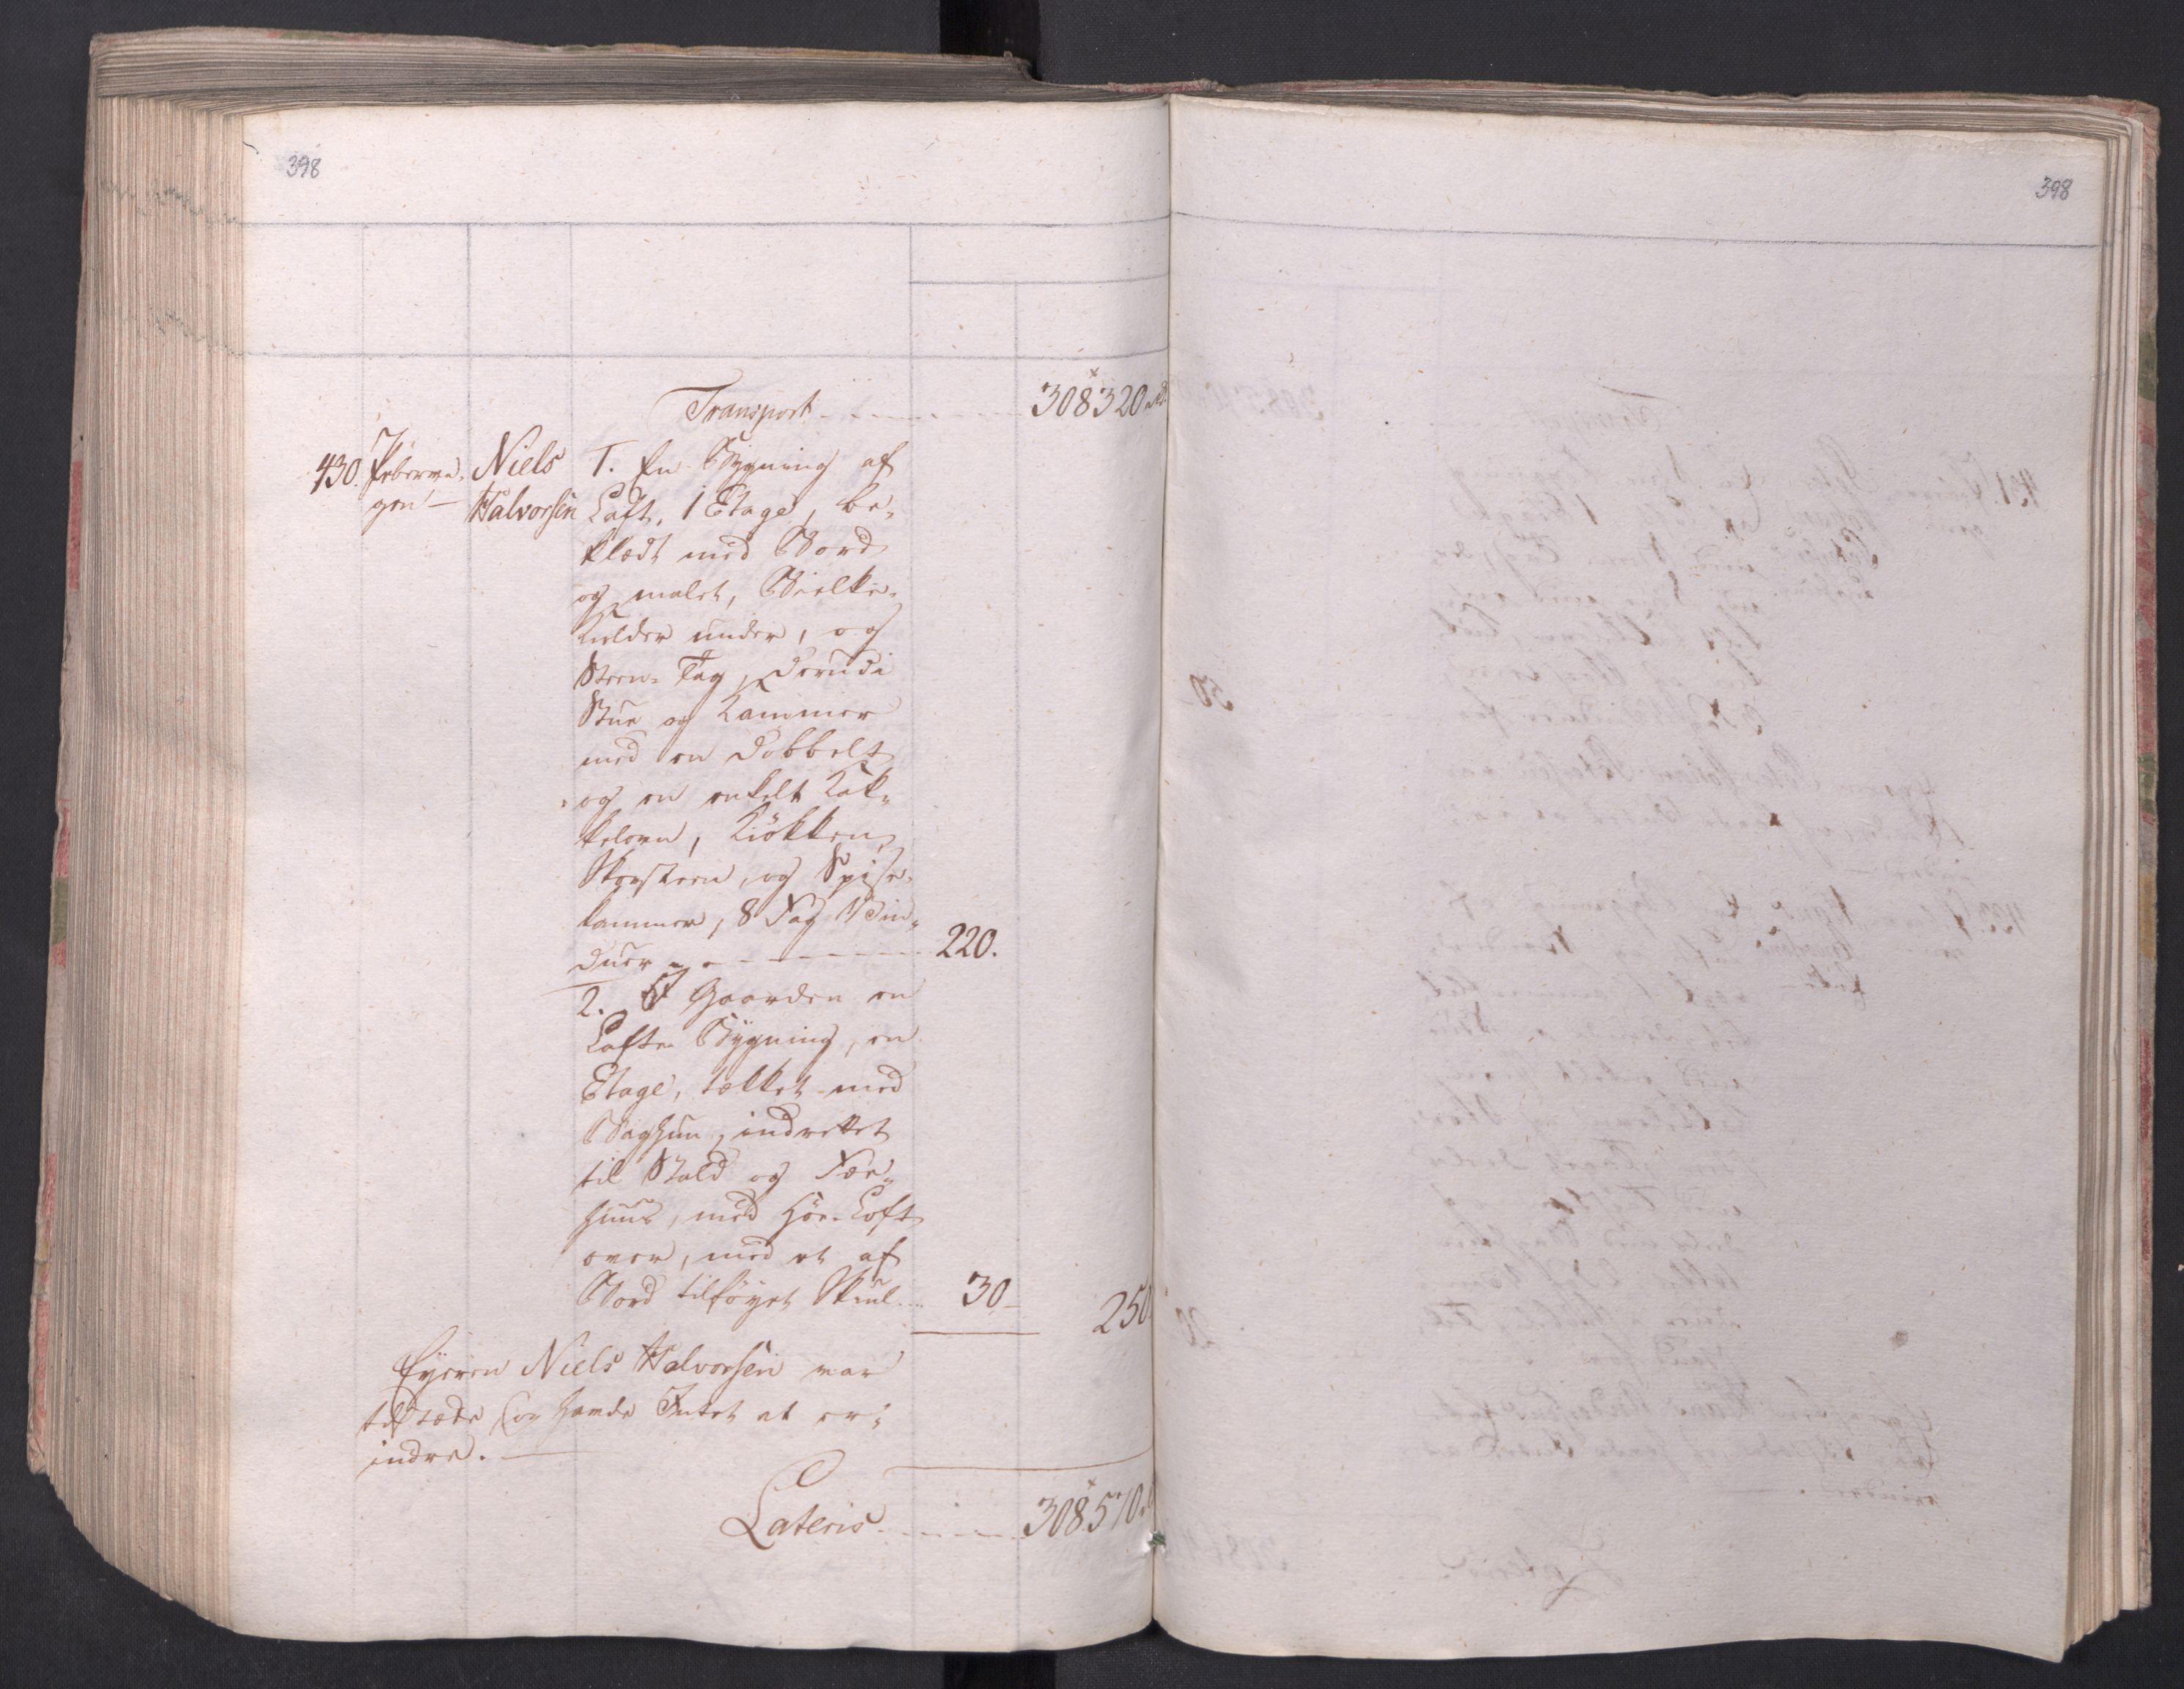 SAO, Kristiania stiftamt, I/Ia/L0015: Branntakster, 1797, s. 398